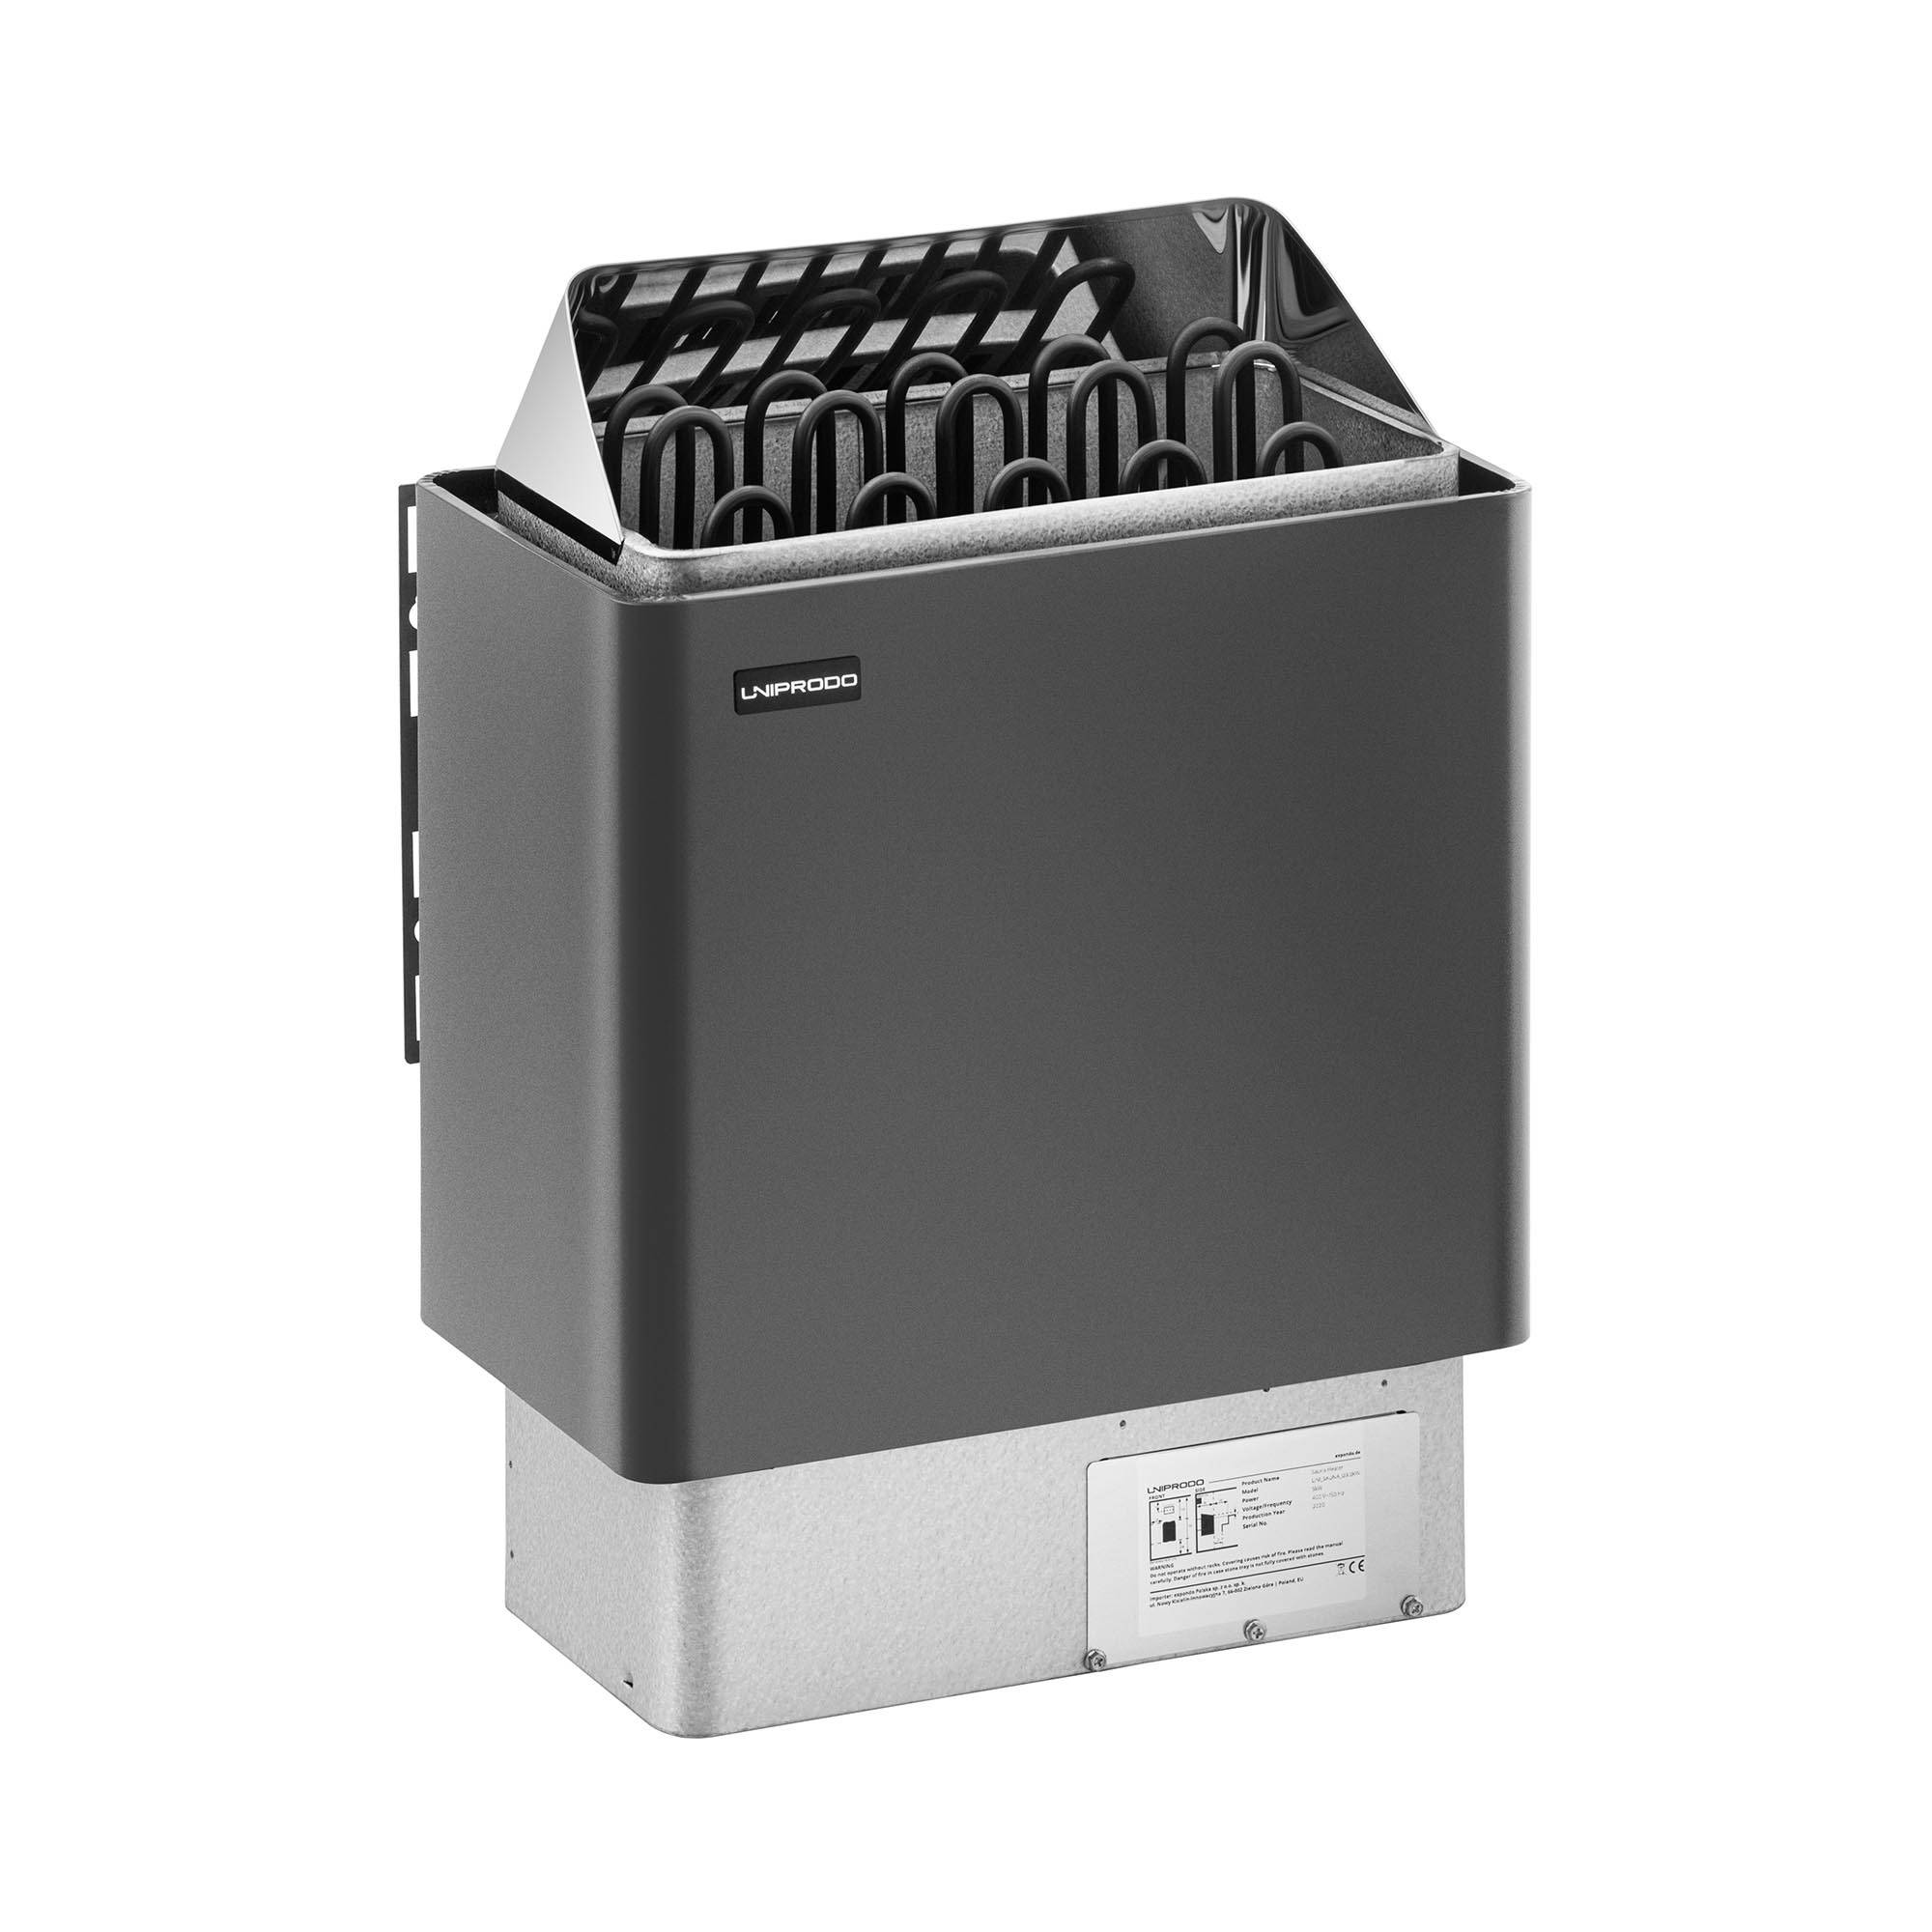 Uniprodo Poêle pour sauna - 9 kW - 30 à 110 °C UNI_SAUNA_G9.0KW